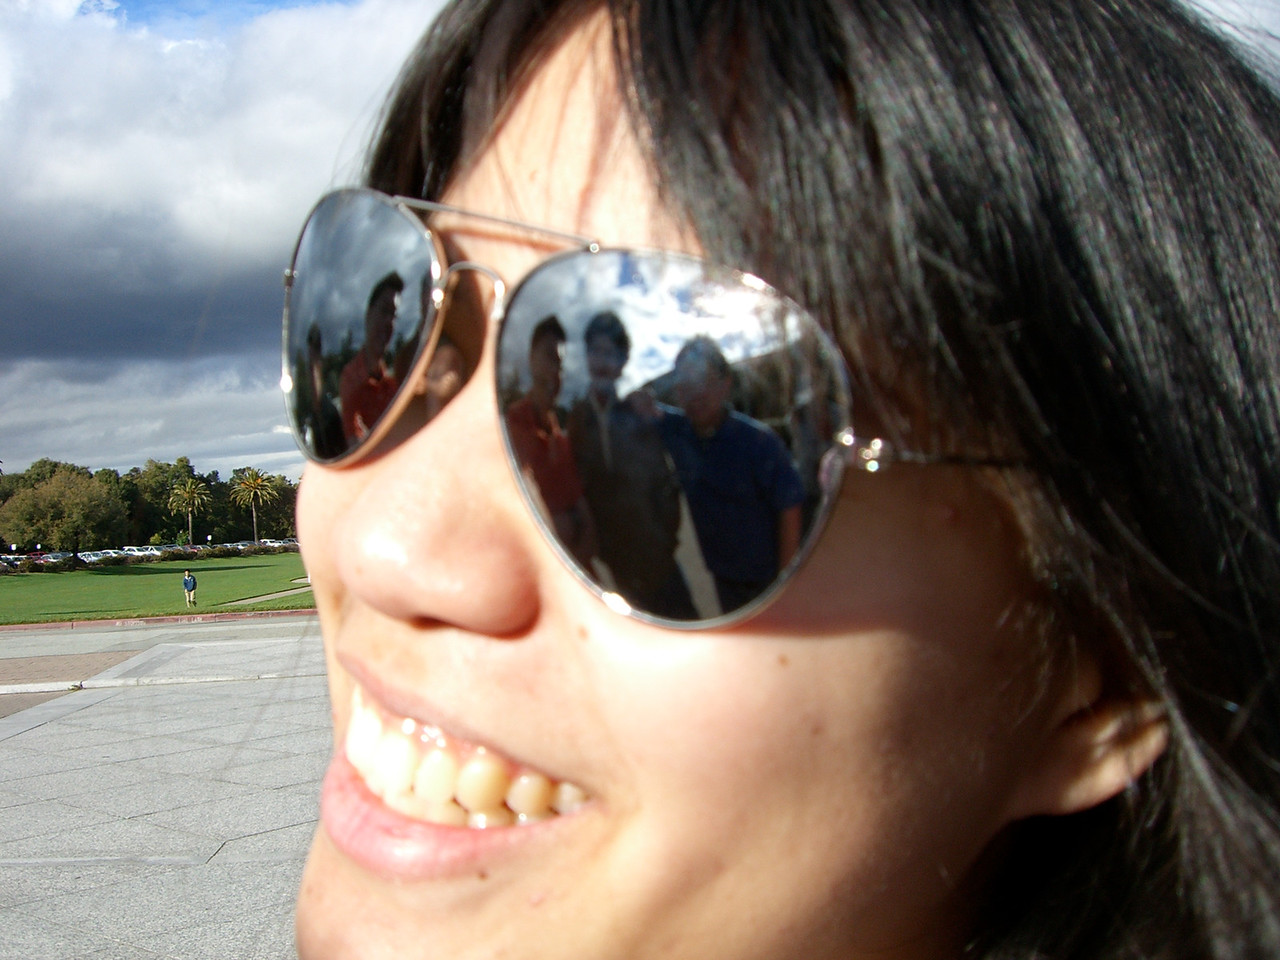 2006 03 12 Sun - Joseph Tan, Pablo Pozo, & David Chiang shimmer in LeAnn Duong's eye 1